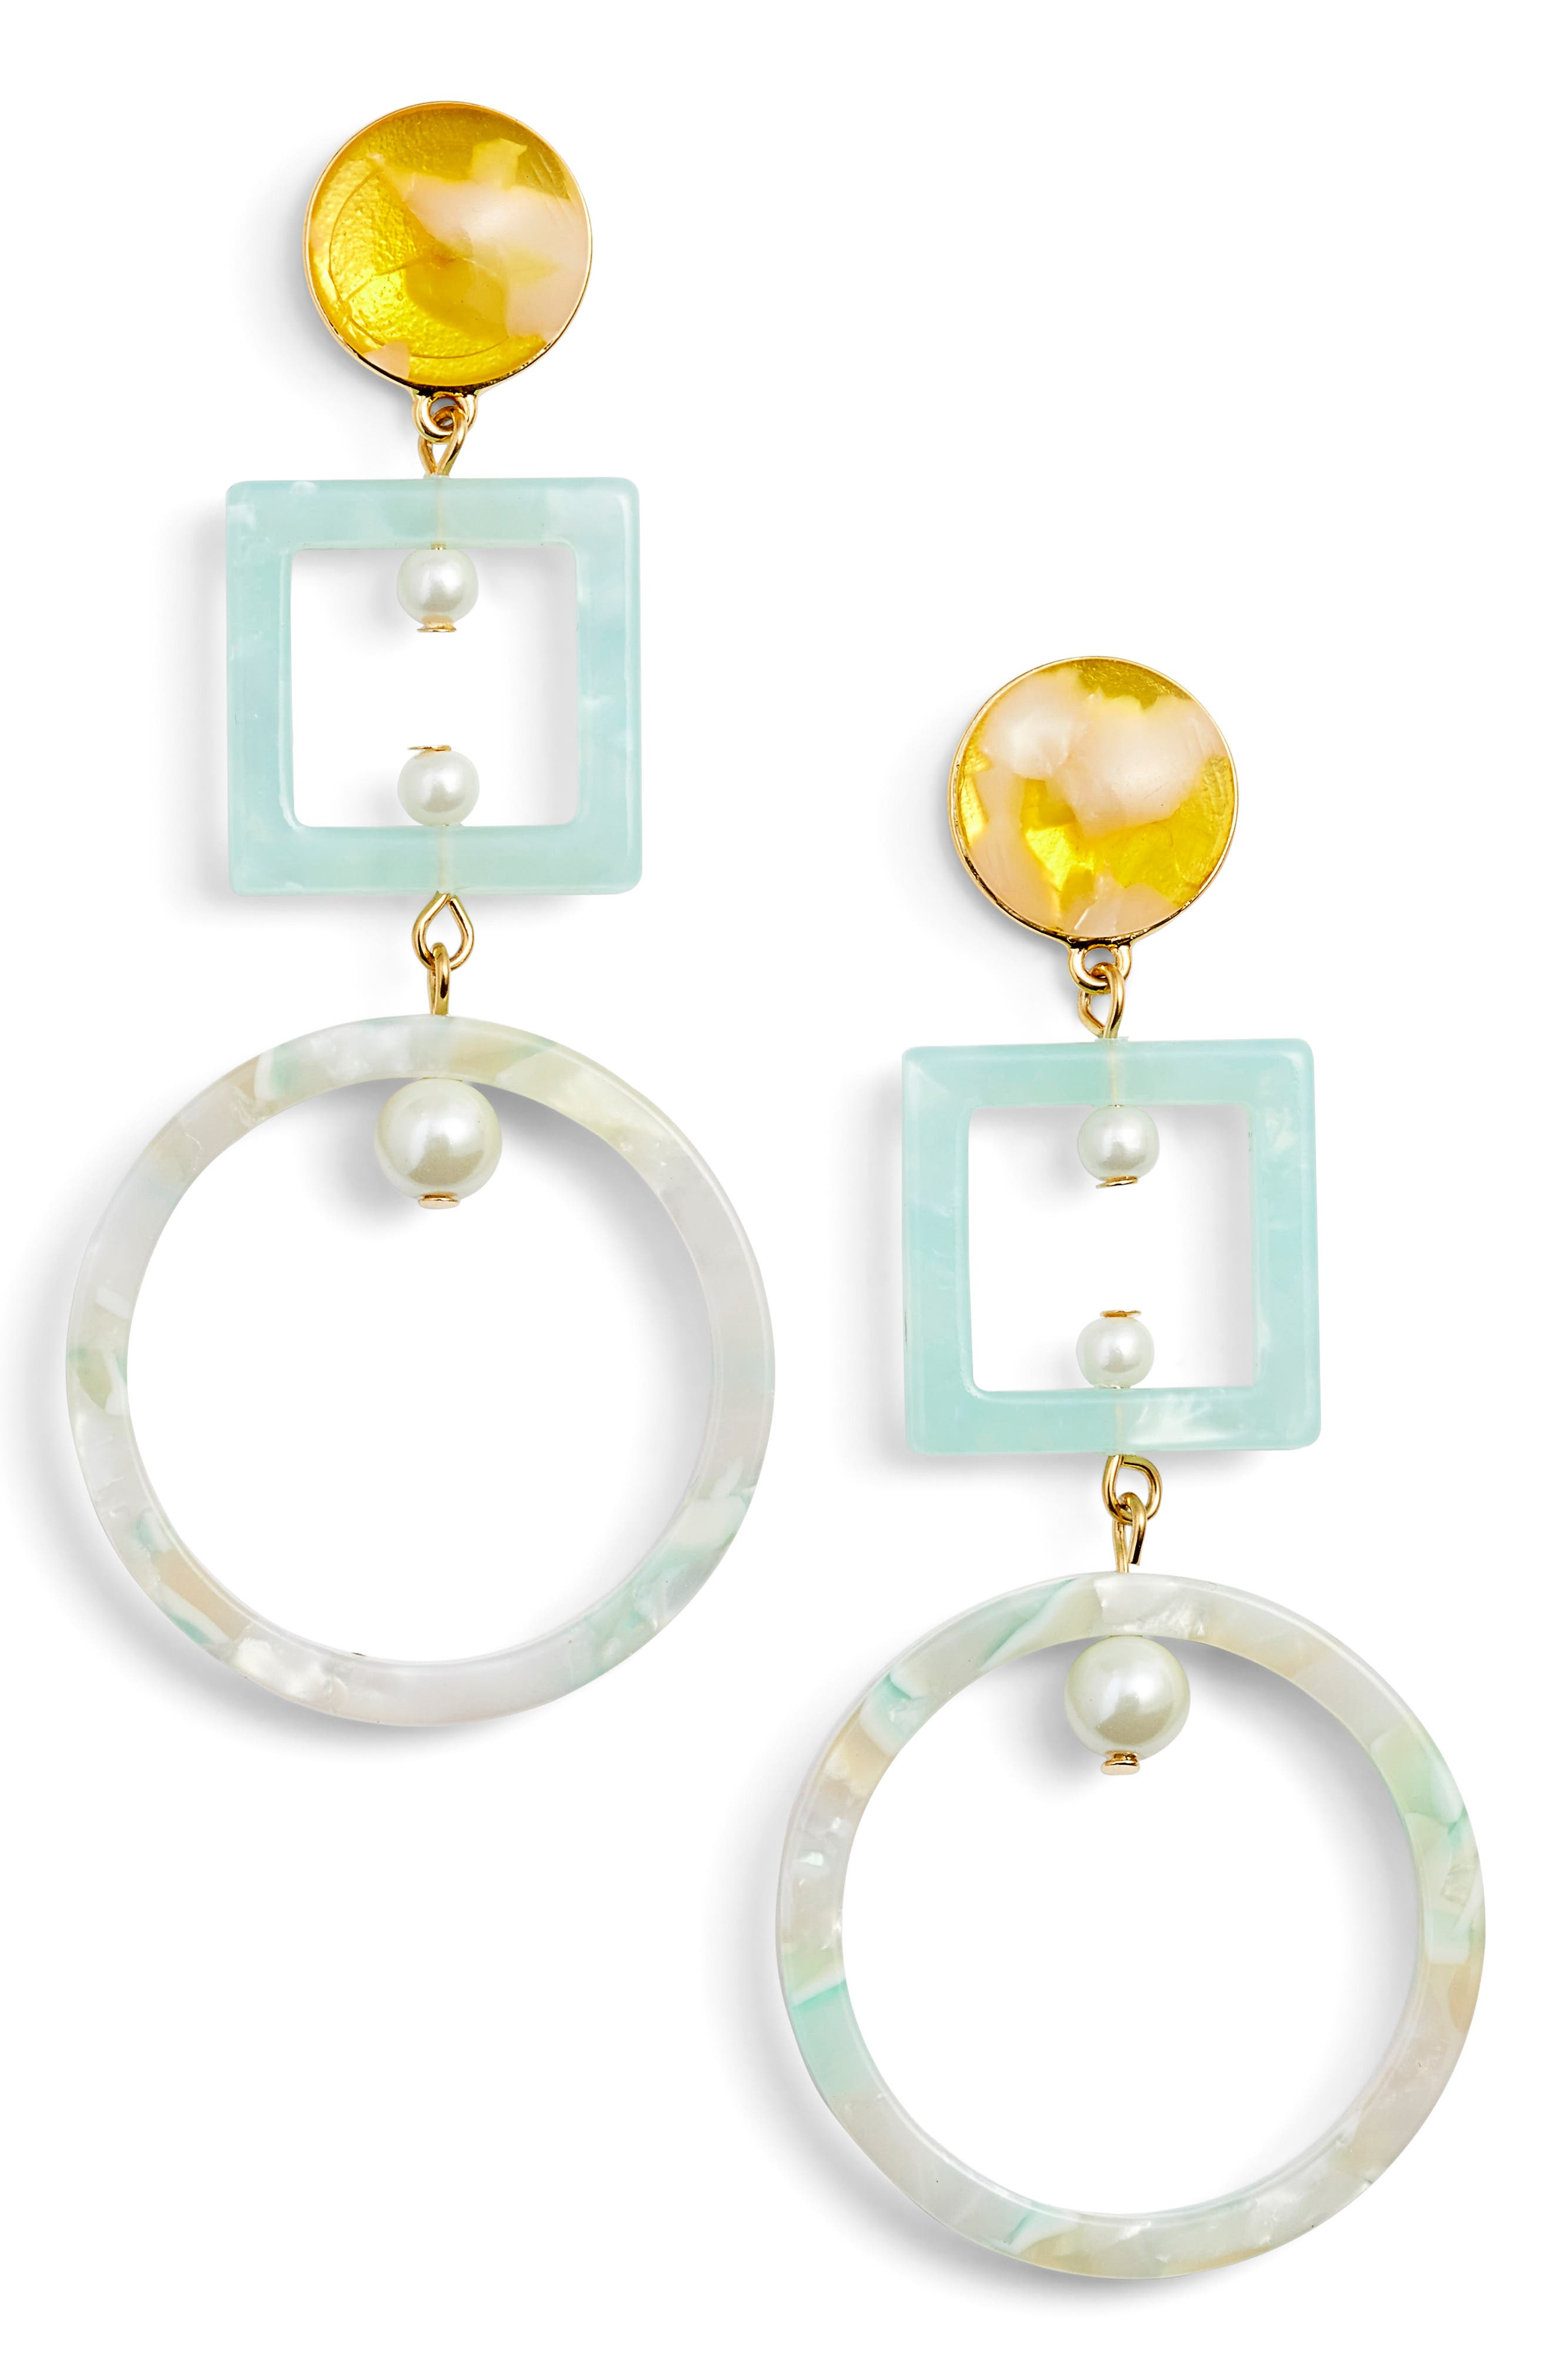 Cage Imitation Pearl Drop Earrings,                             Main thumbnail 1, color,                             SUNSHINE YELLOW